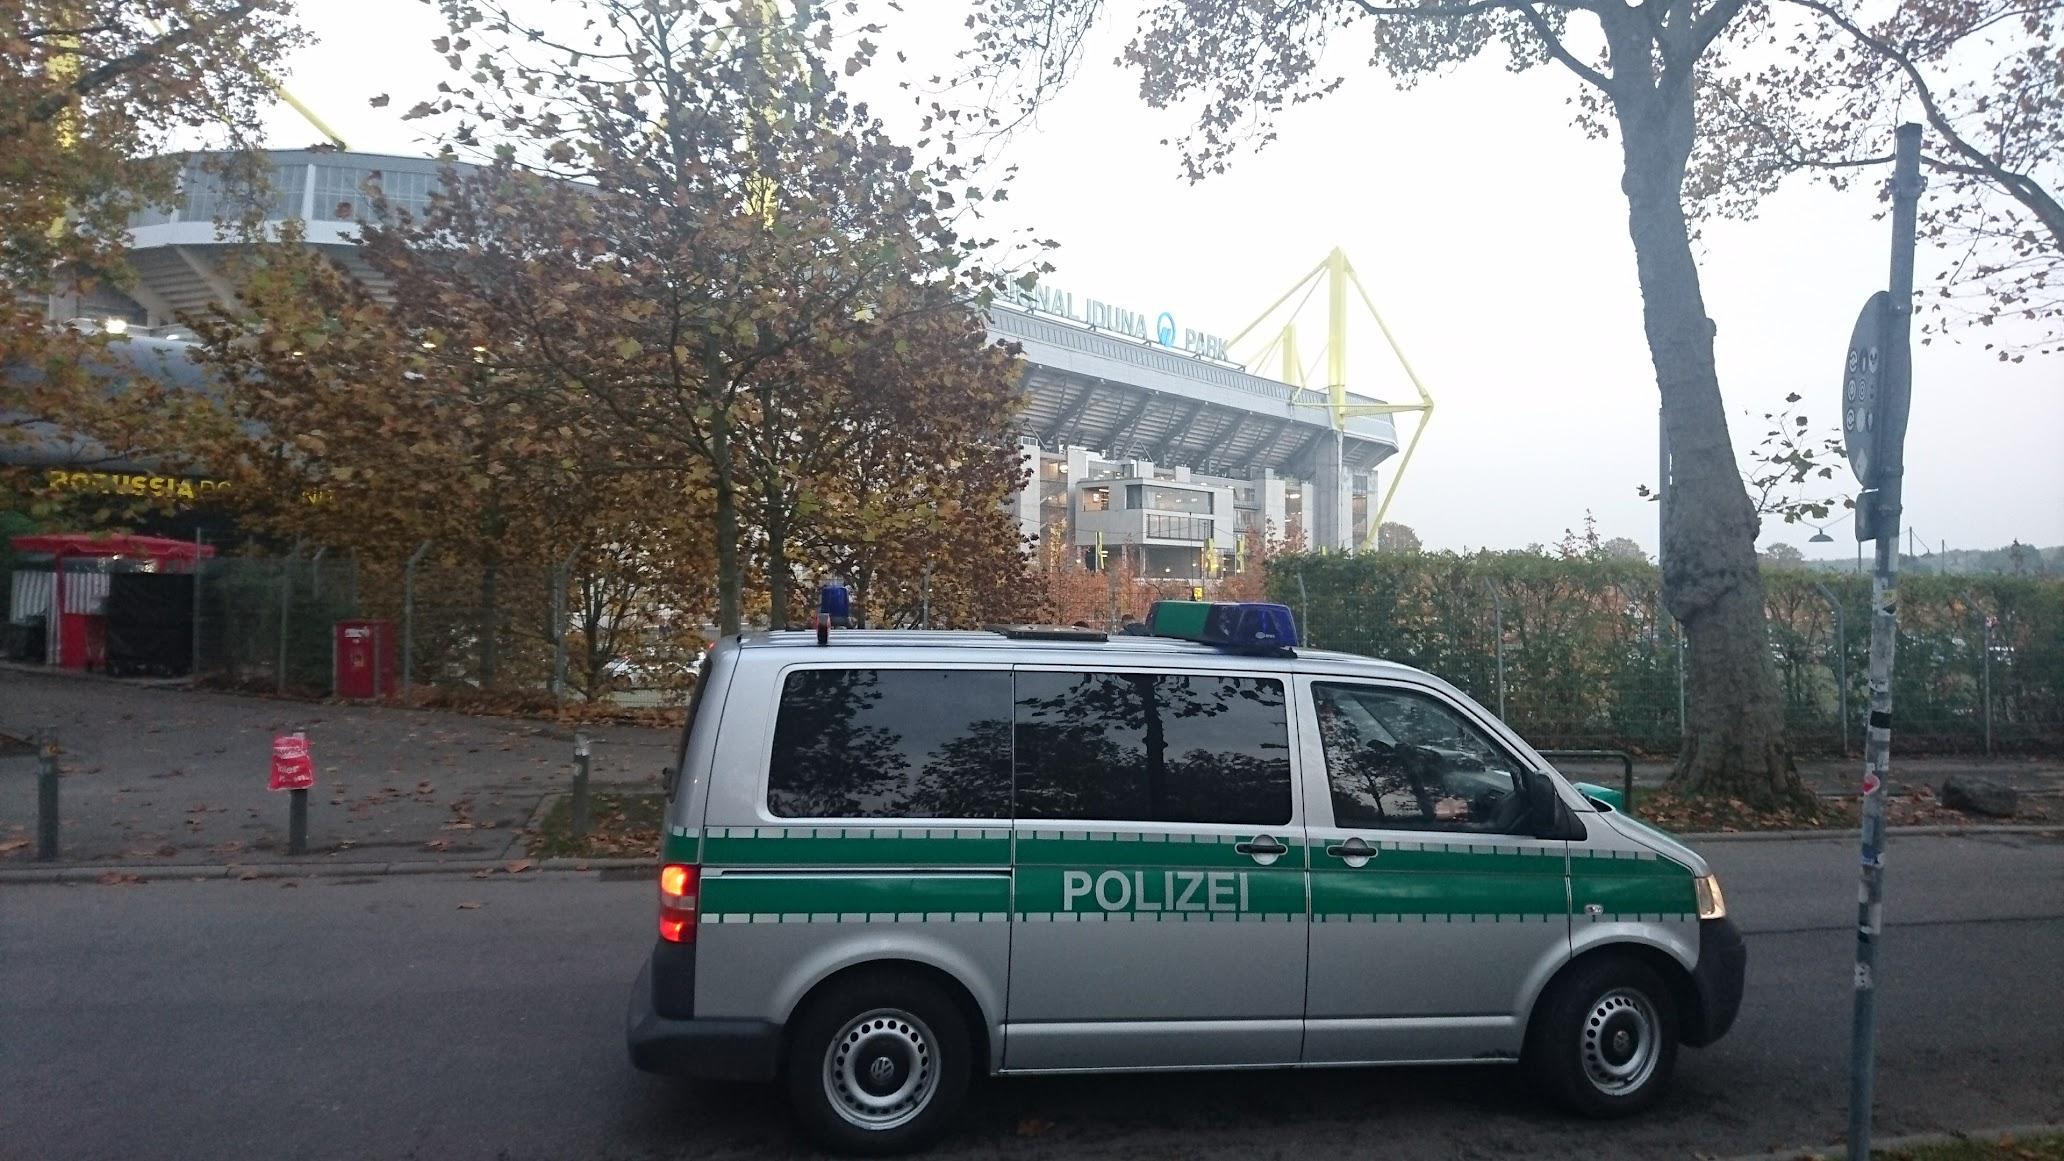 Signal Iduna Park Dortmund Polizei